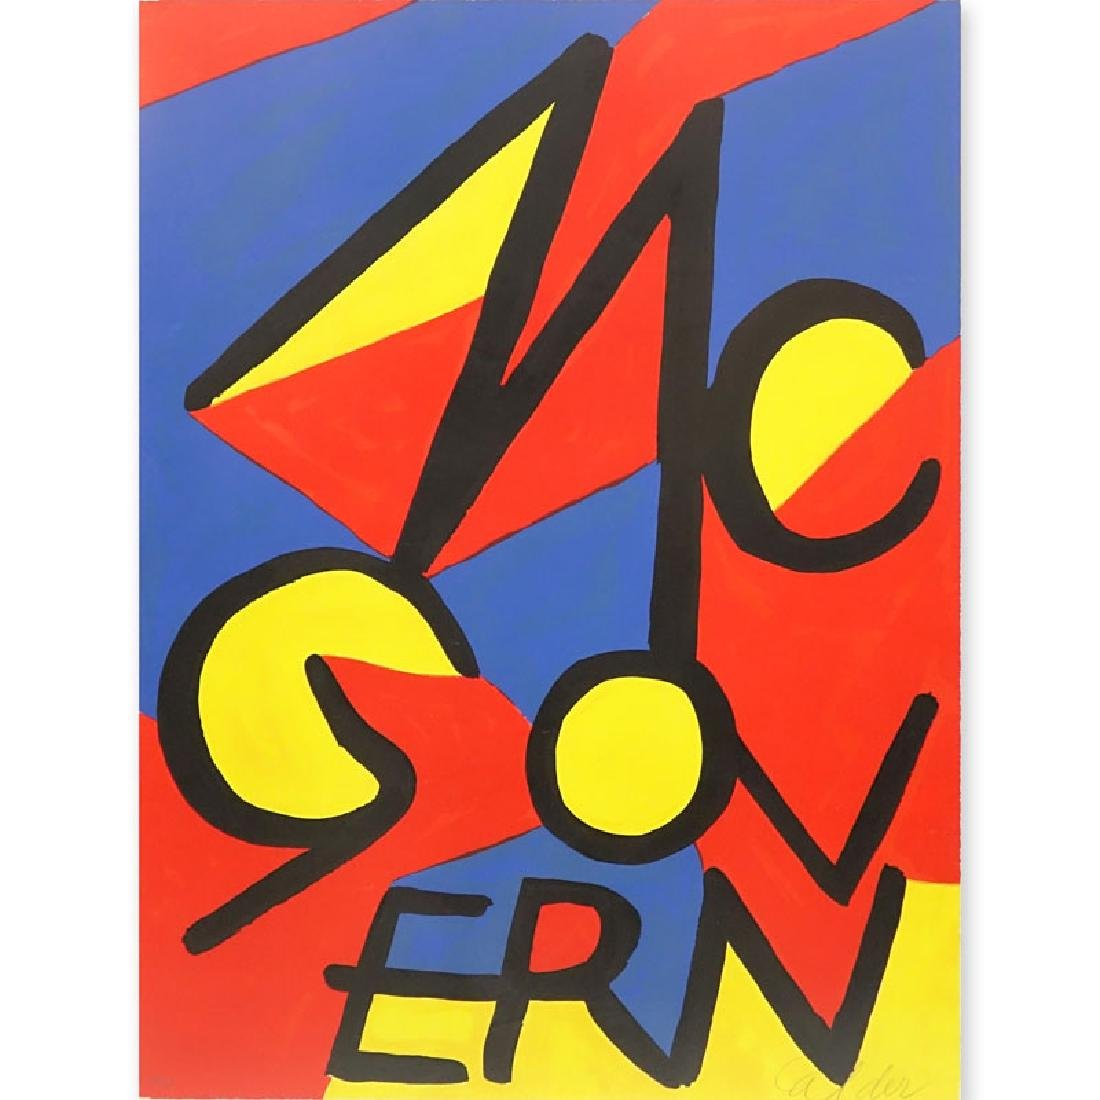 Alexander Calder, American (1898-1976) Color lithograph